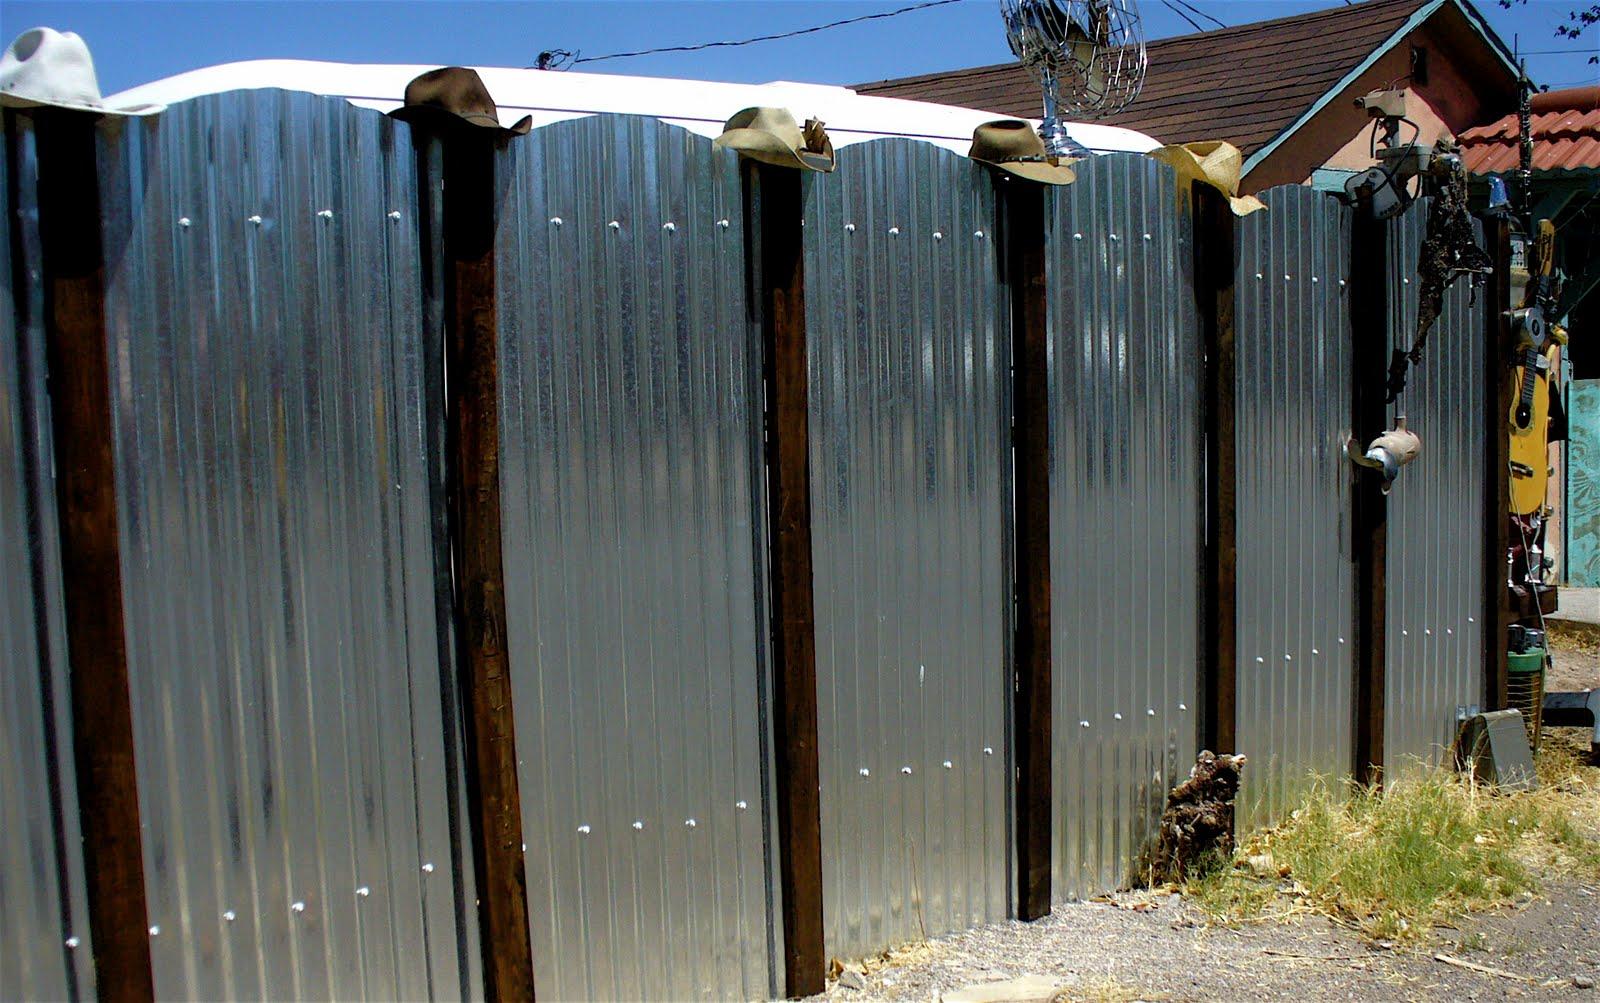 Alt build blog more on fences for Cool fences